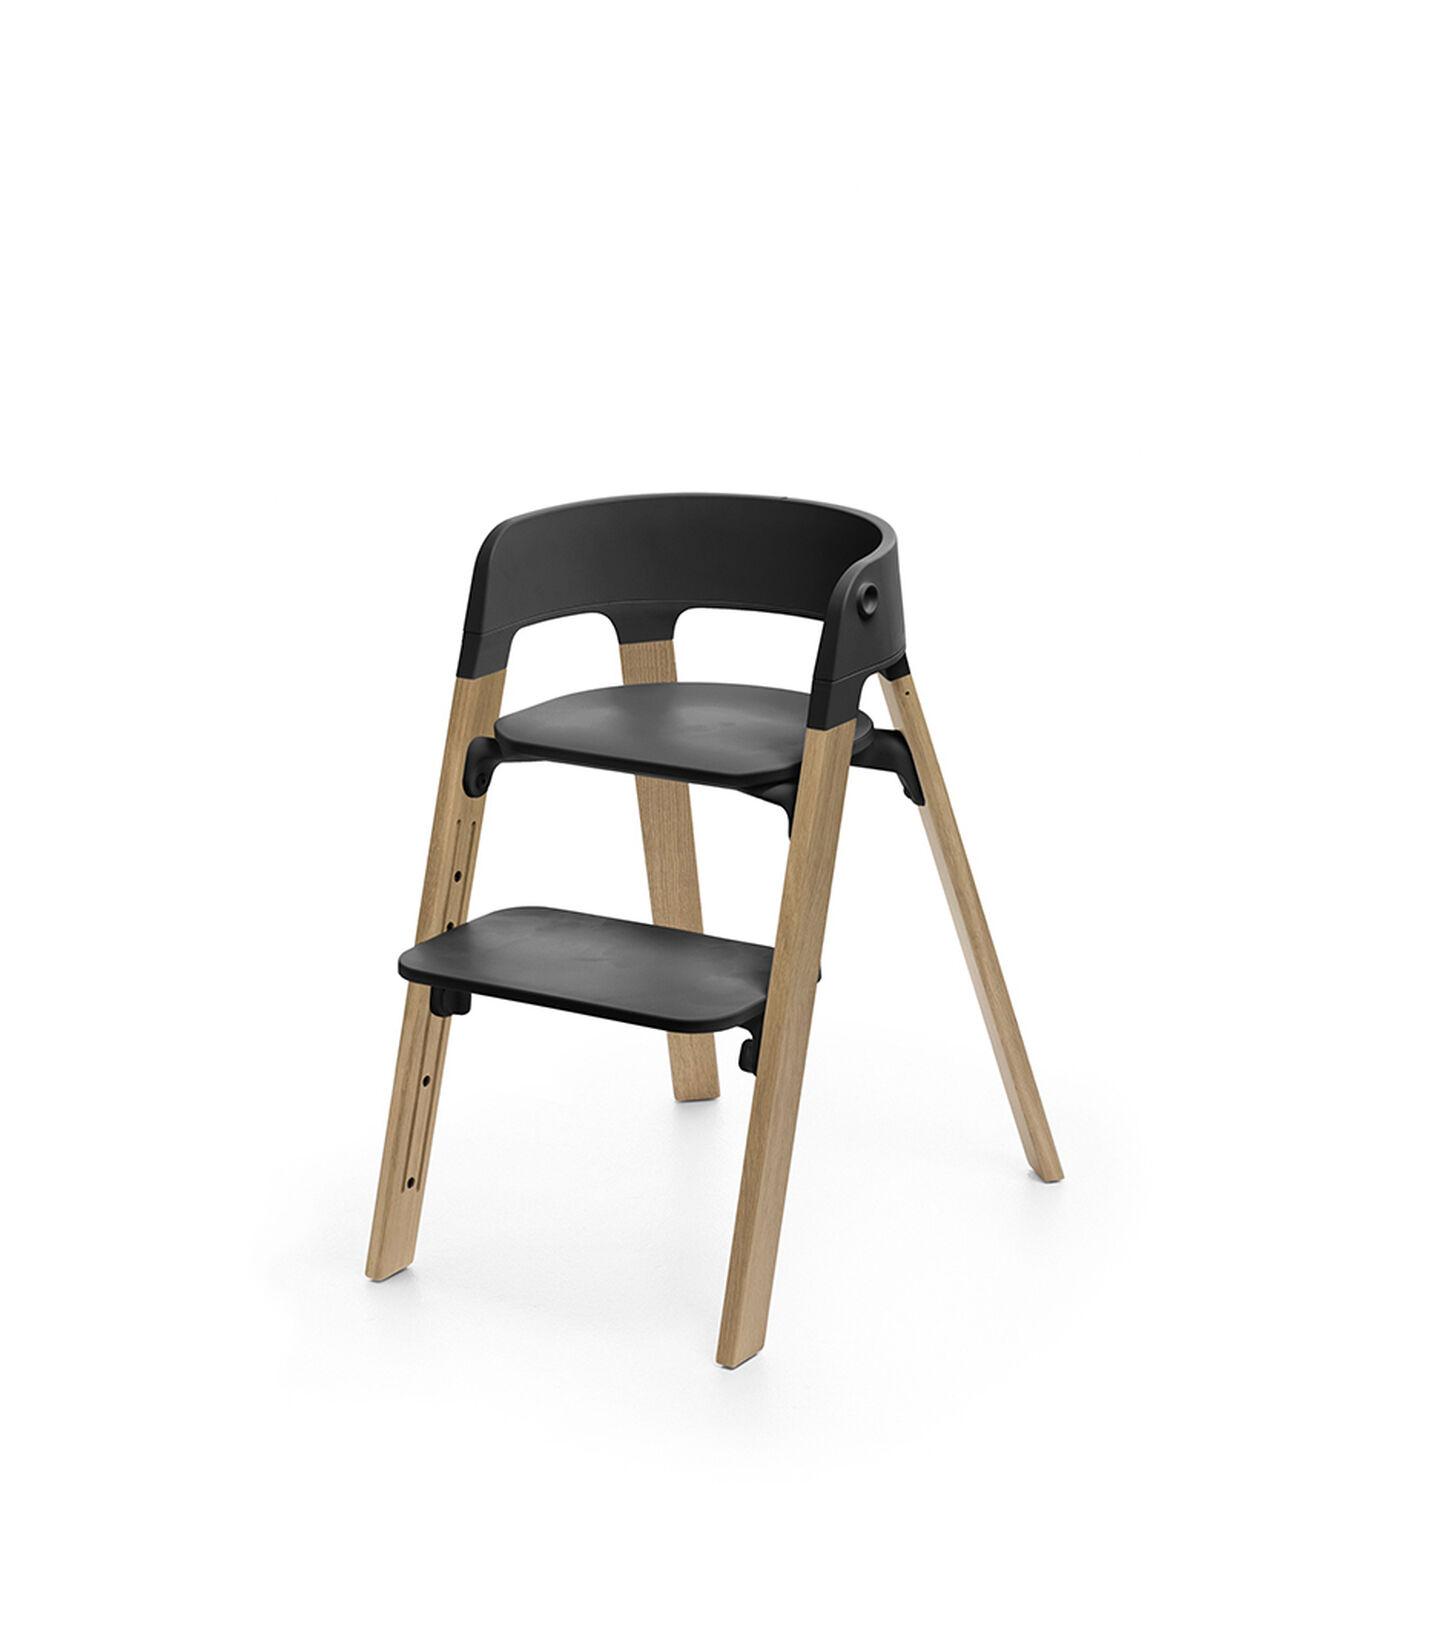 Stokke® Steps™ Chair Black Seat Oak Natural Legs, Oak Natural, mainview view 1